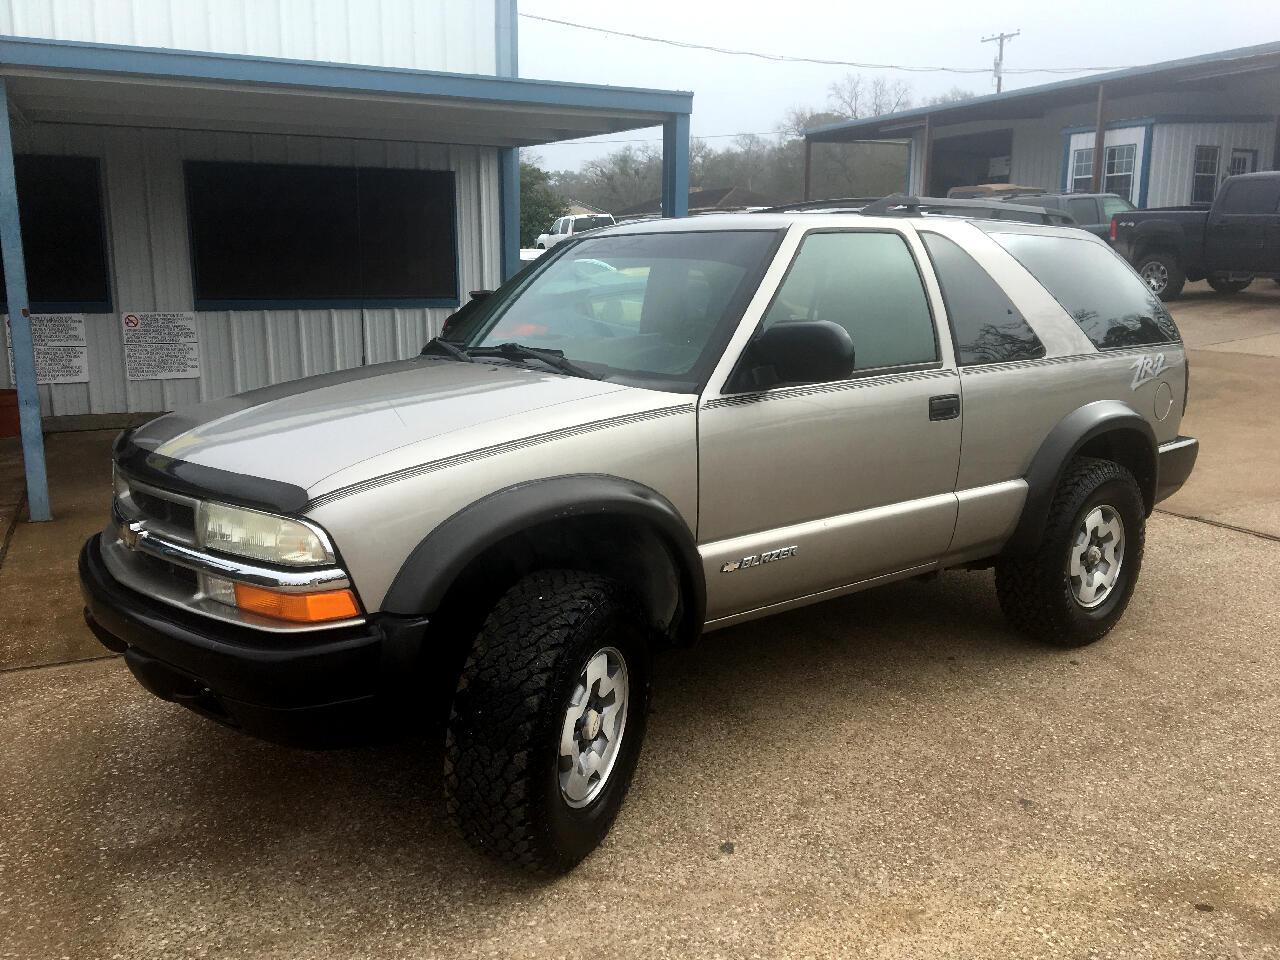 2004 Chevrolet Blazer 2dr 4WD LS